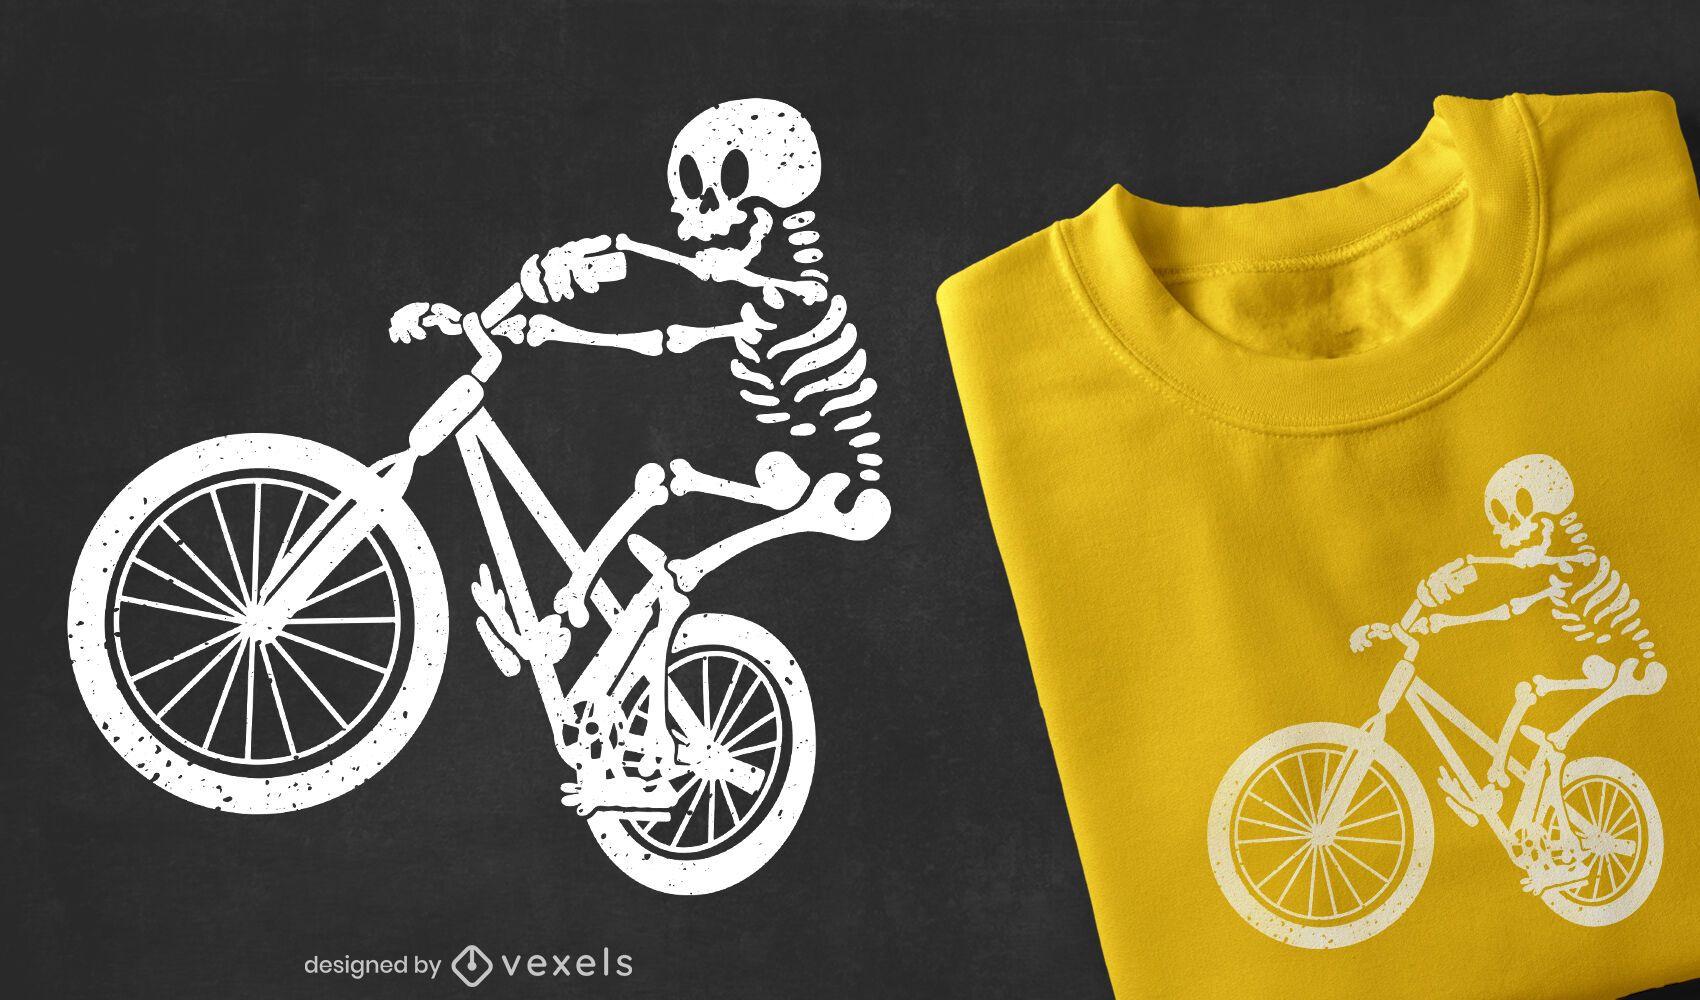 Skeleton biker t-shirt design